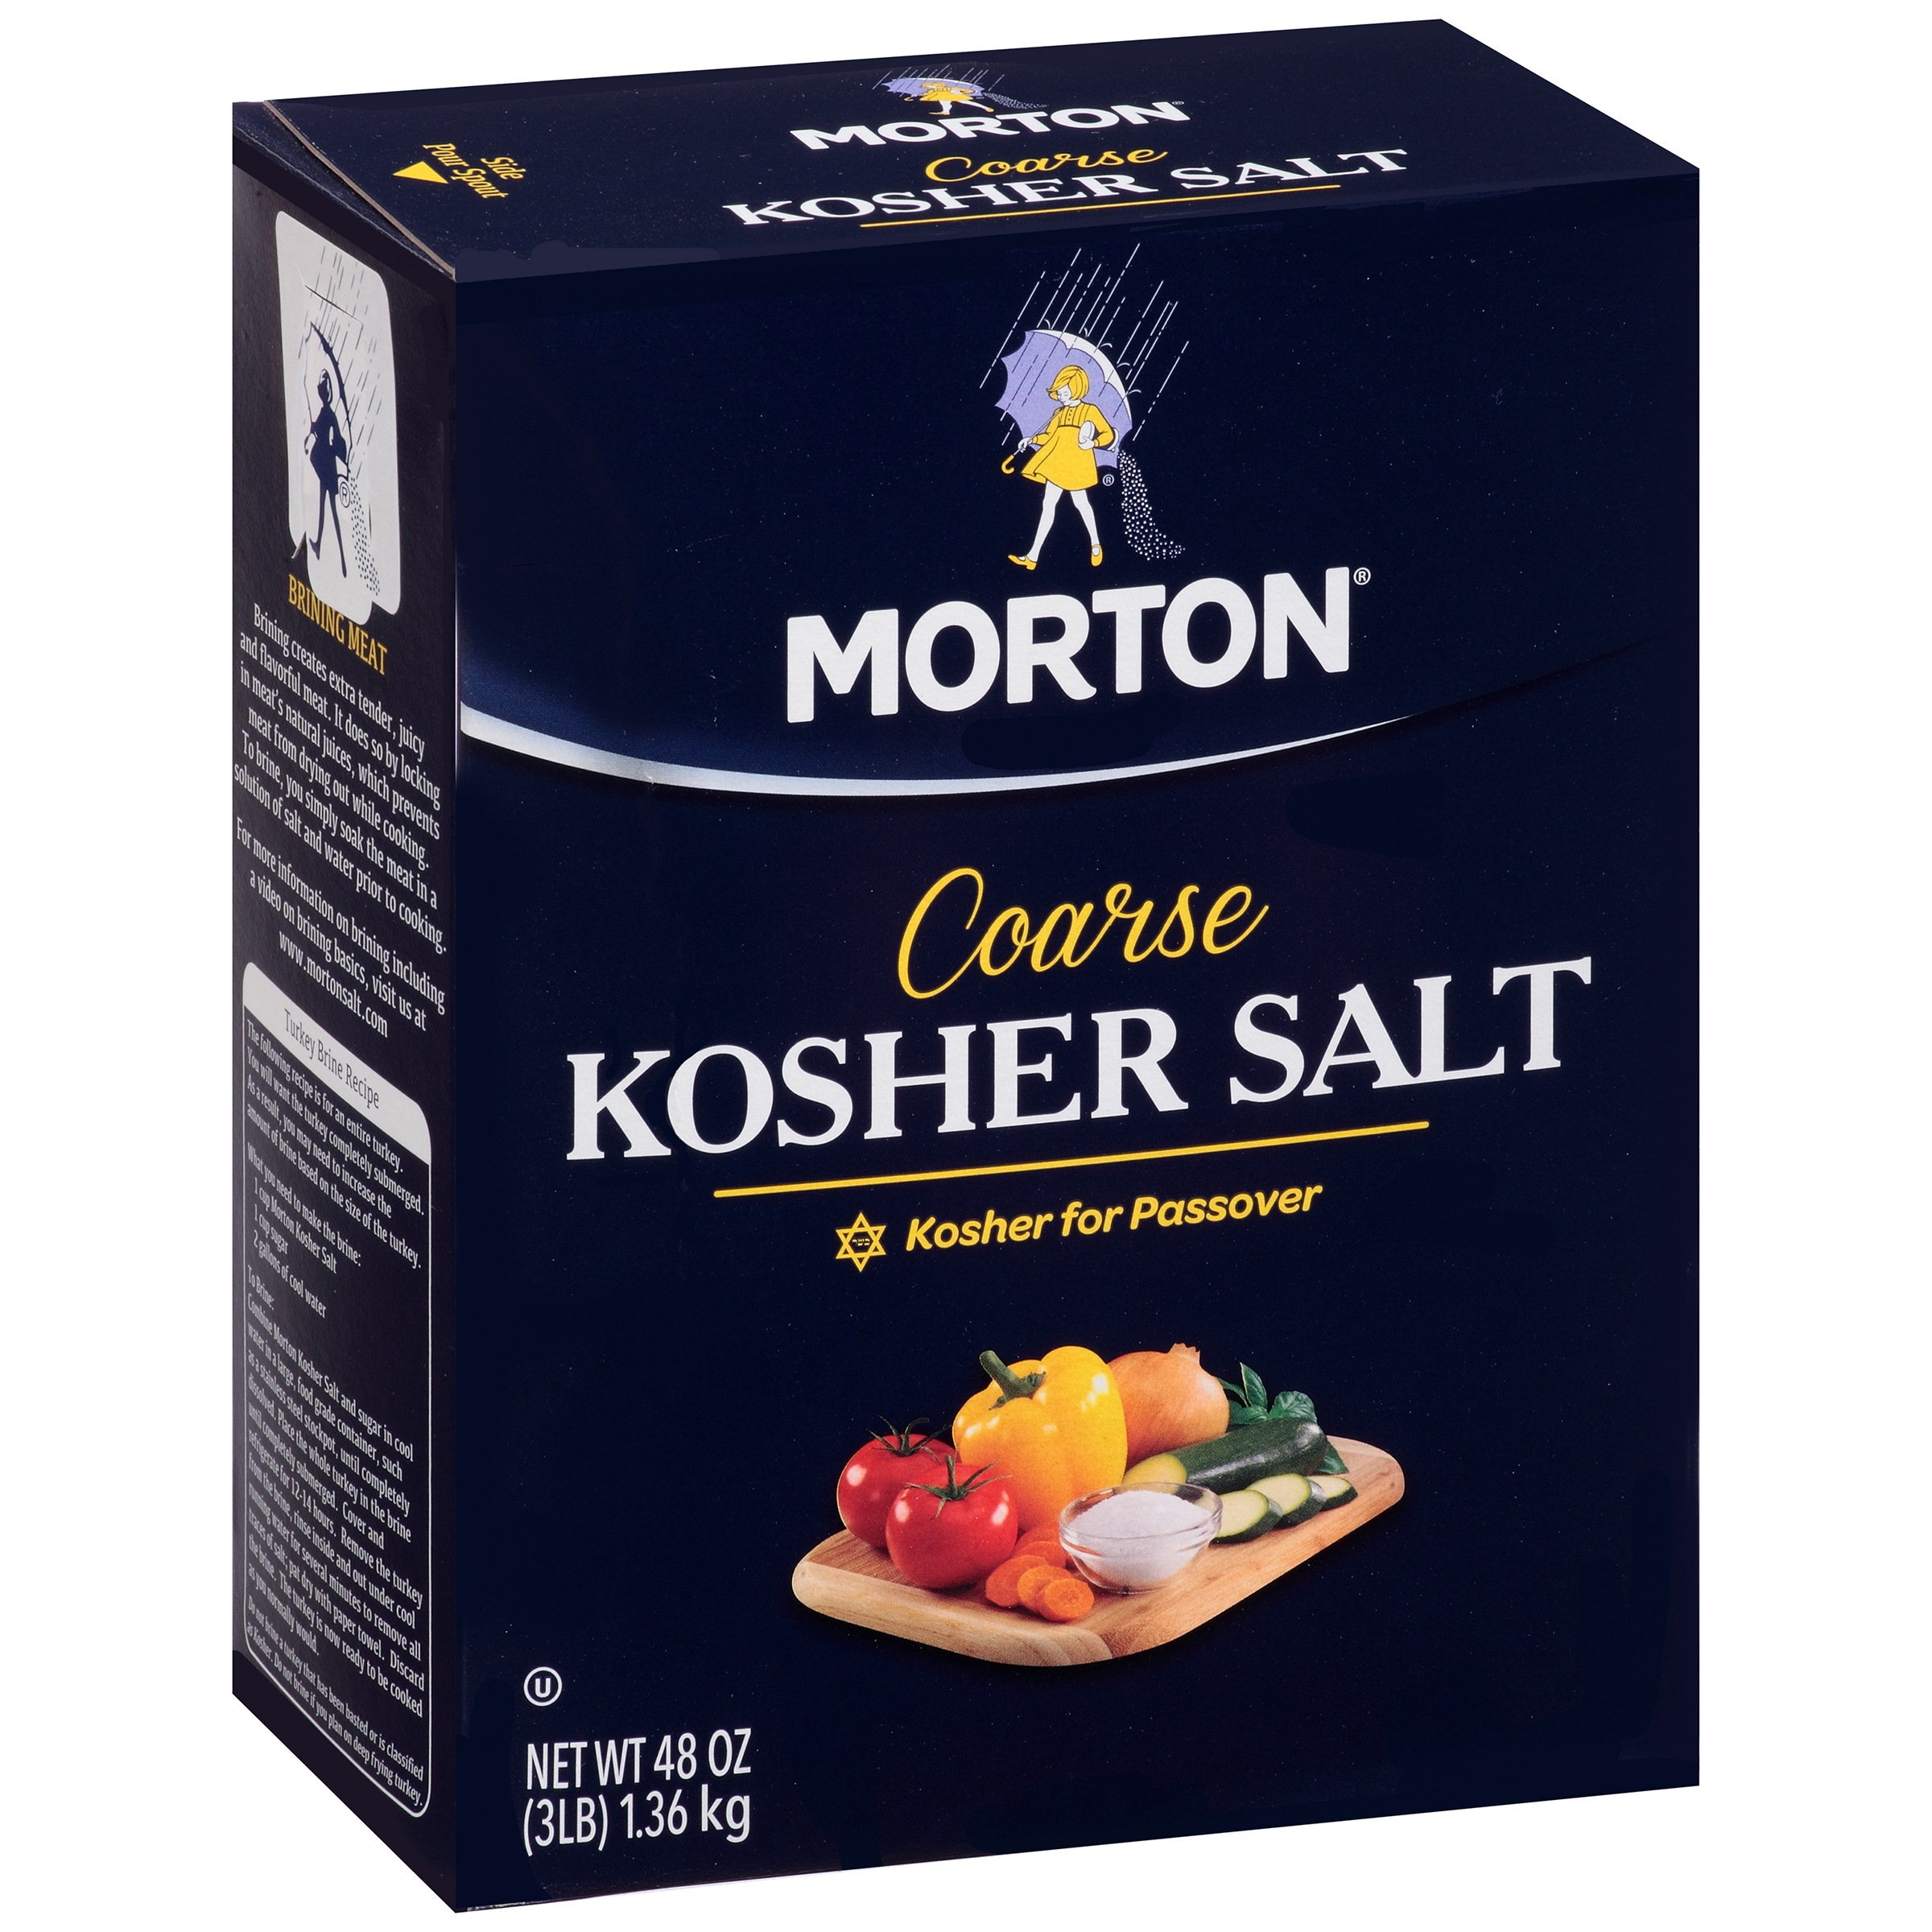 Morton Coarse Kosher Salt, 48.0 OZ by Morton Salt, Inc.